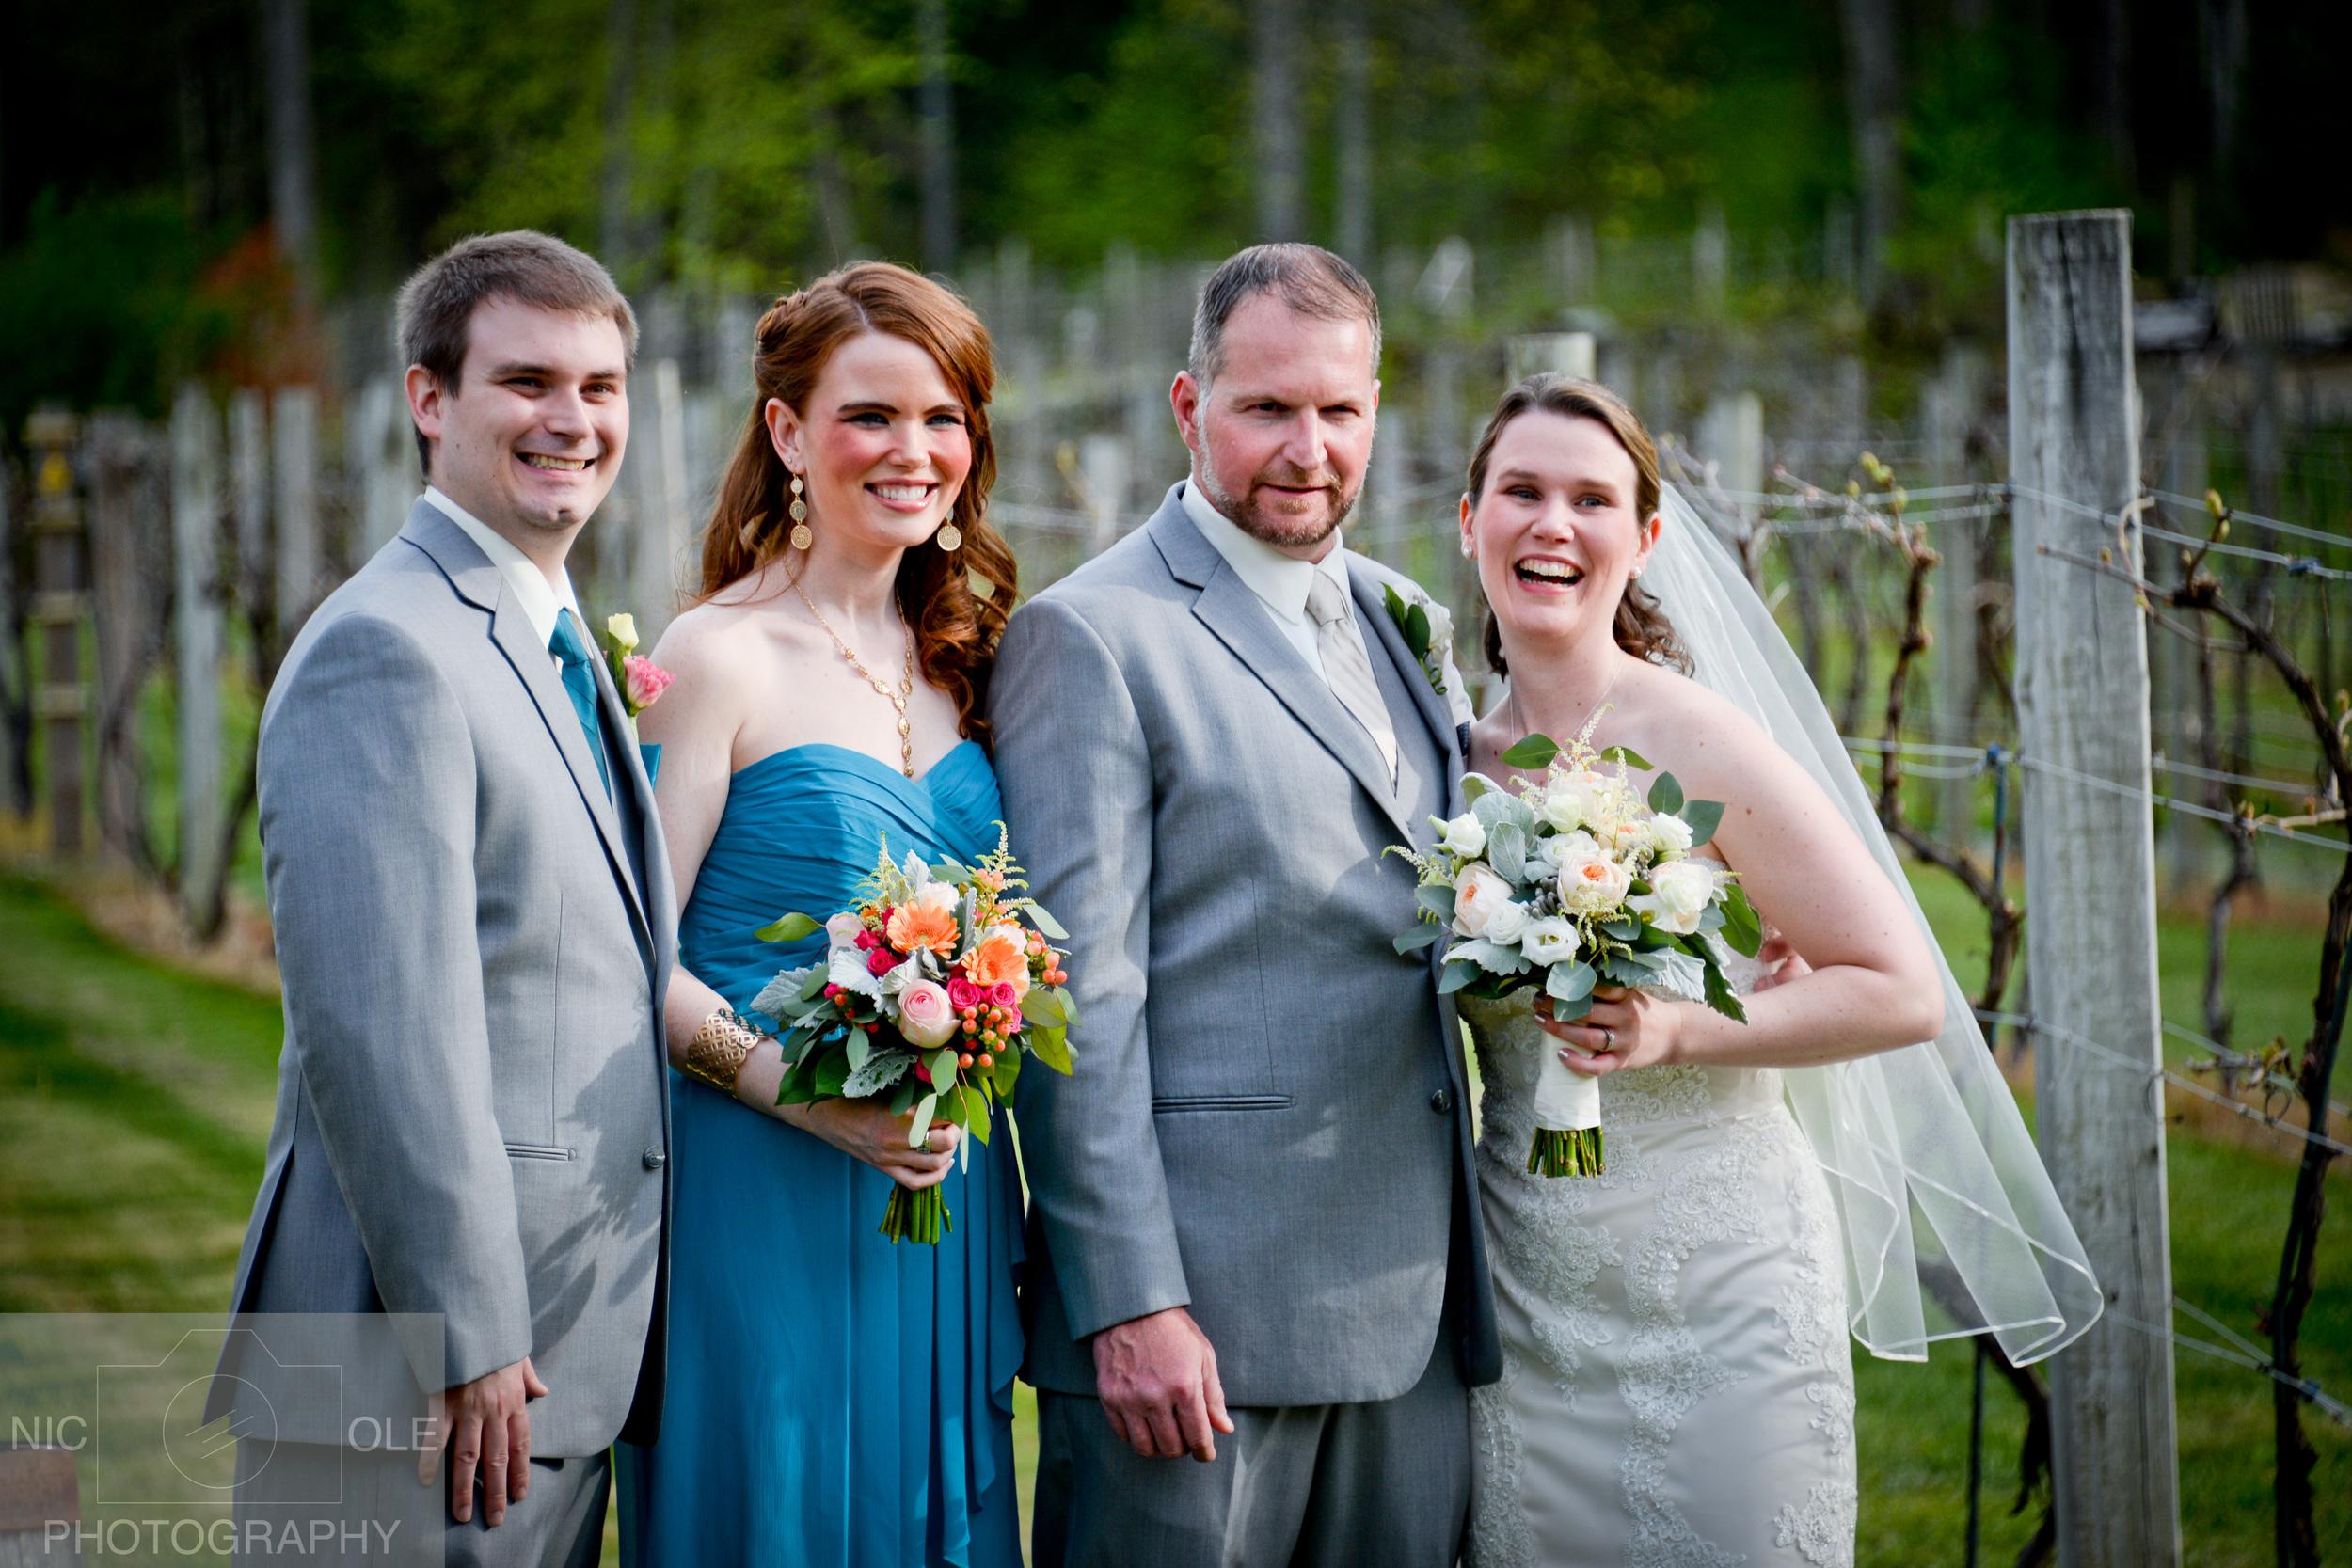 Kevin & Rachel - NIC-OLE Photography--12.jpg